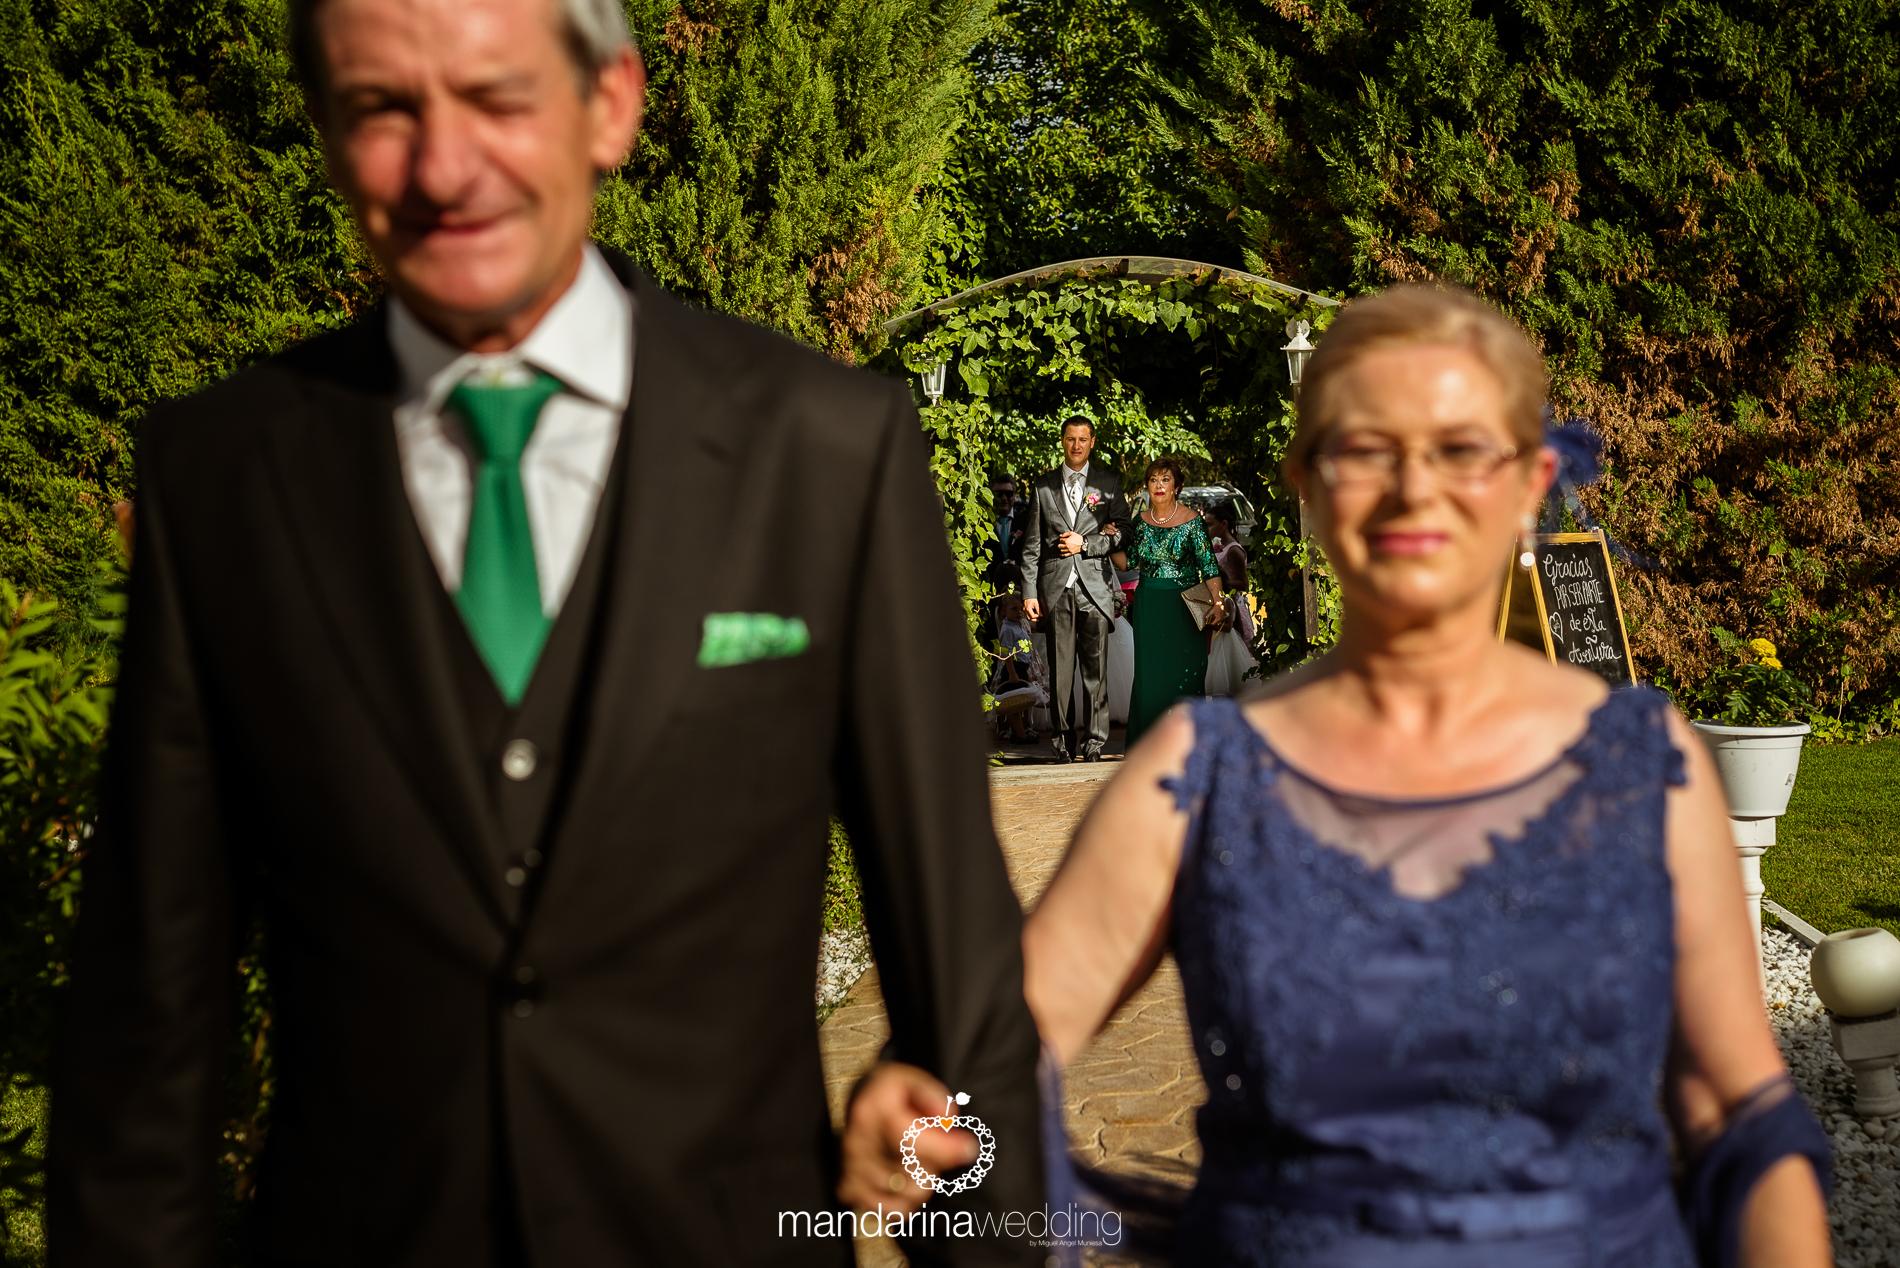 mandarina wedding, mejores fotografos boda, fotografo zaragoza, fotografo huesca, fotografo soria, fotografo lerida_51